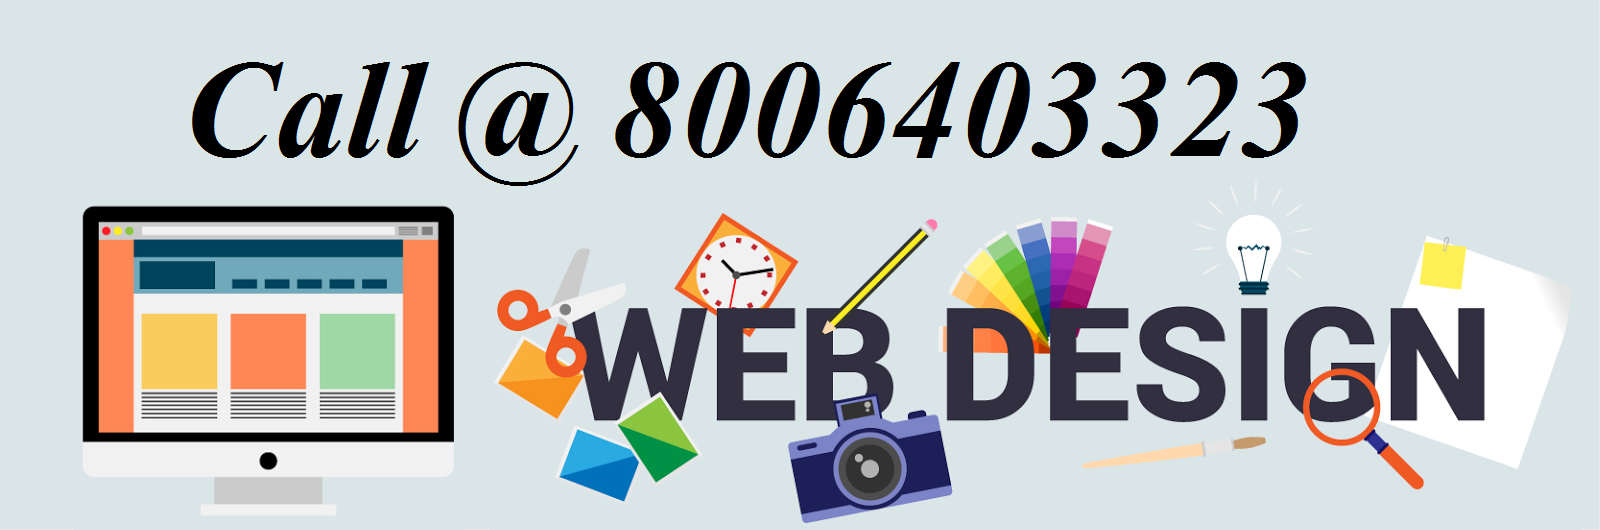 Website Designing Company In Begum Pul Meerut Best Websi Custom Web Design Website Design Services Website Design Company